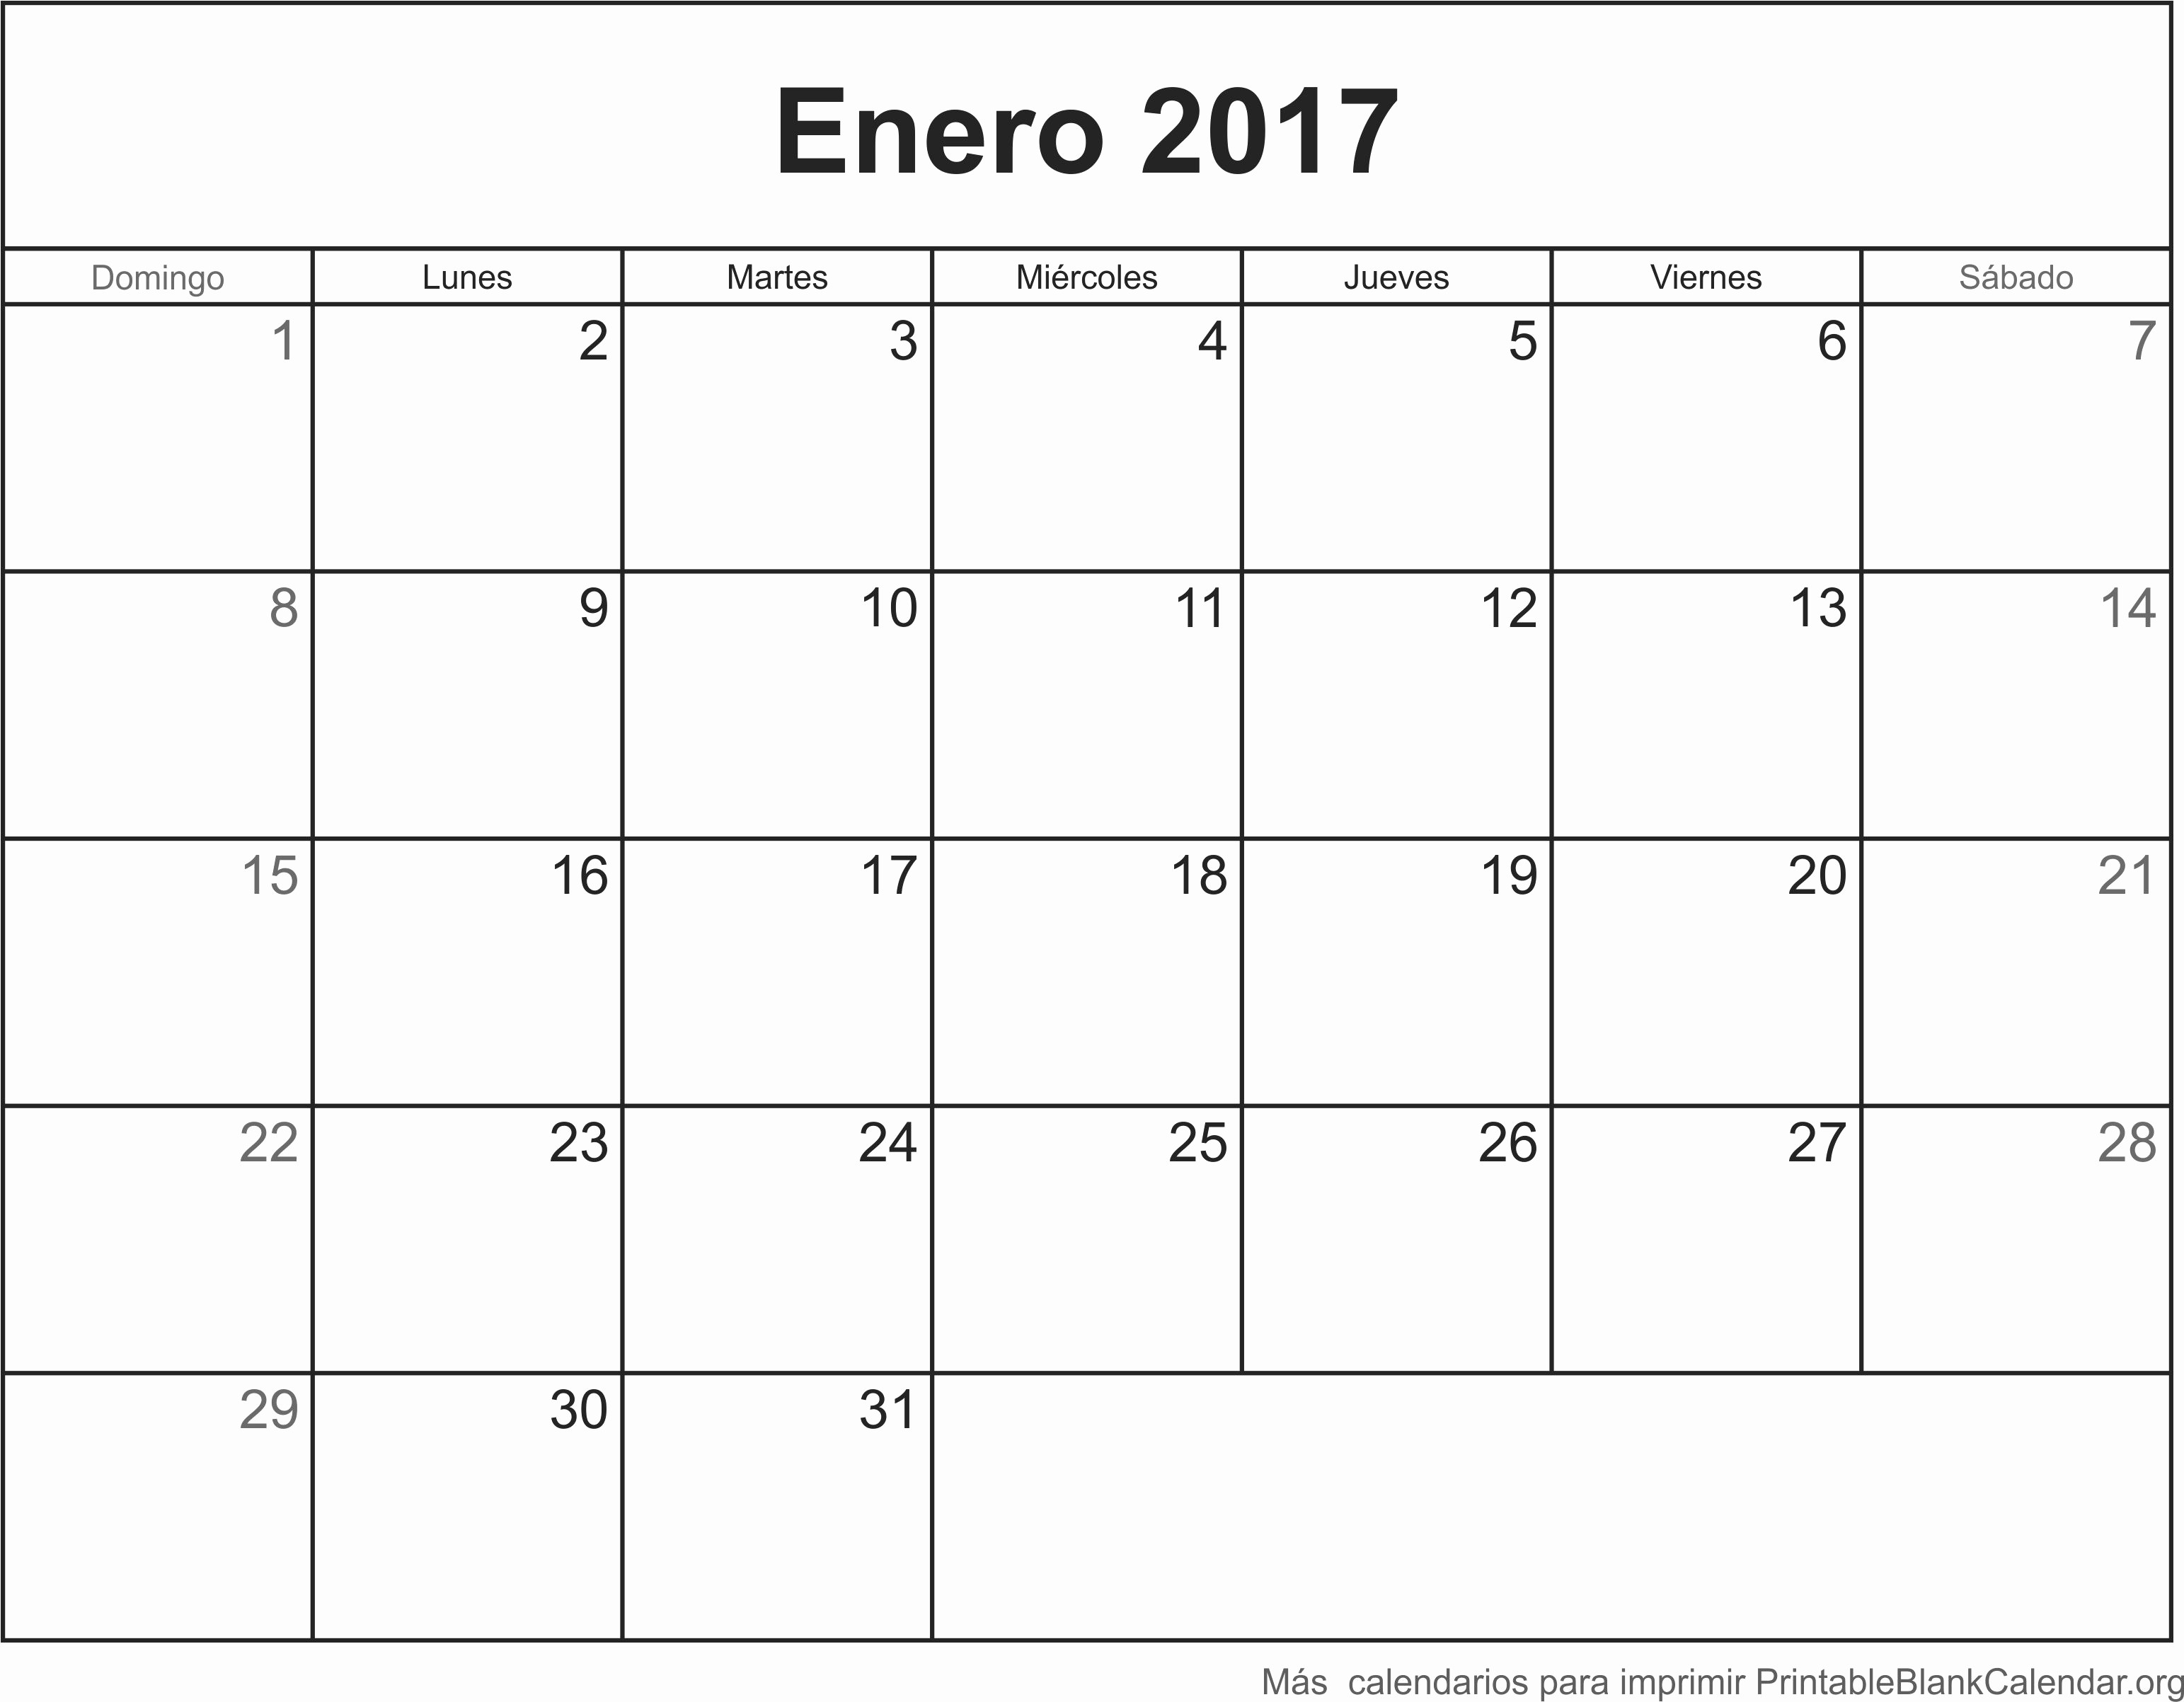 Calendario Anual 2017 Para Imprimir Beautiful Enero 2017 Calendario Para Imprimir Calendarios Para